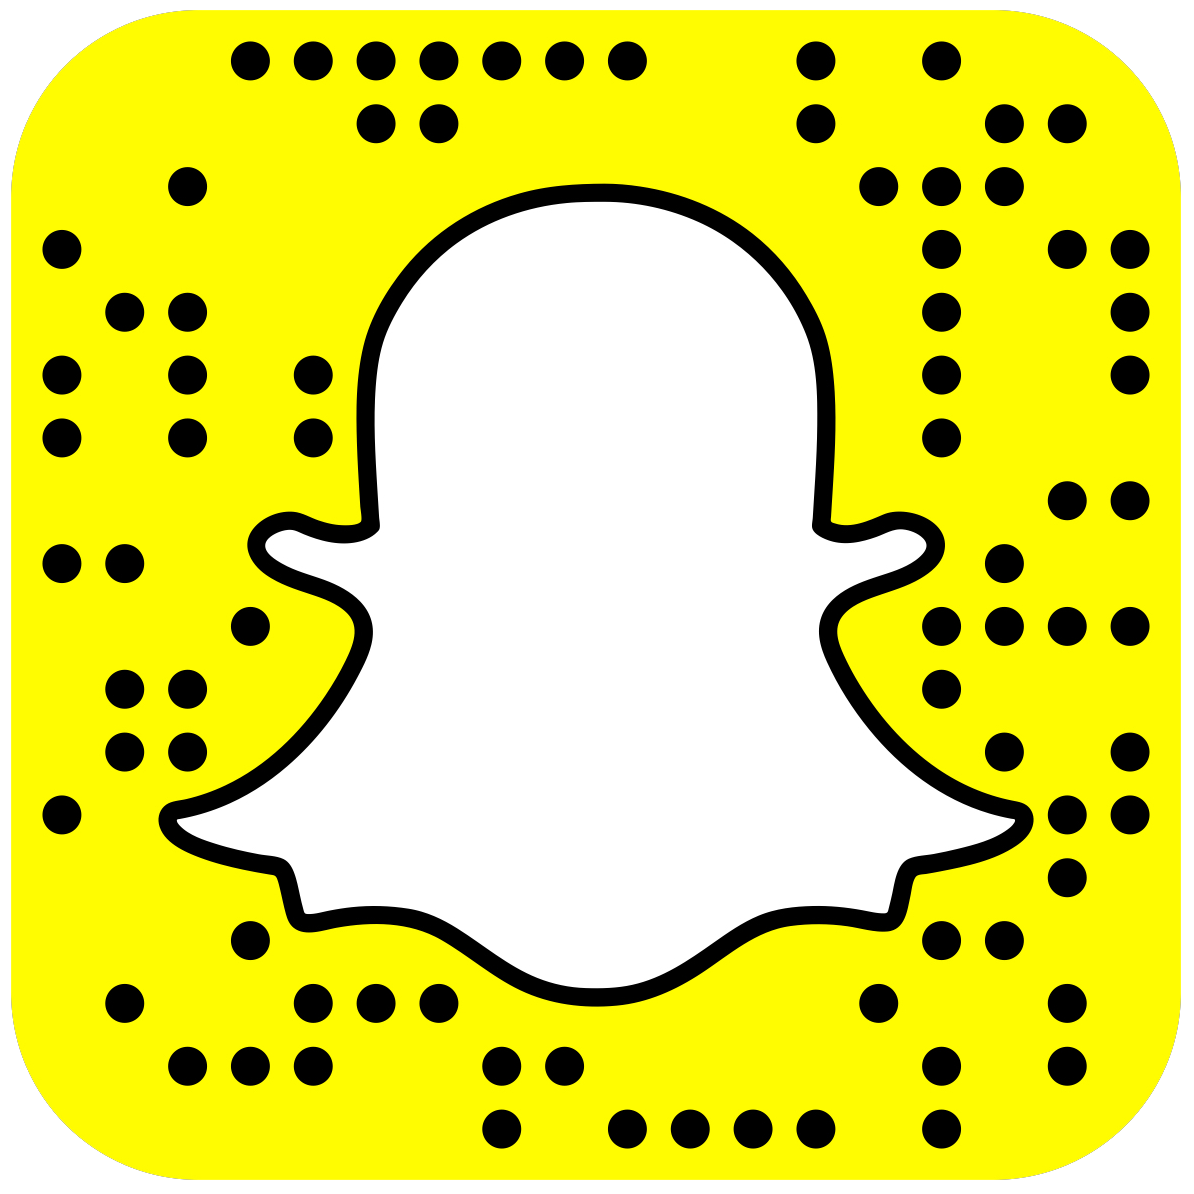 Troian Bellisario Snapchat username